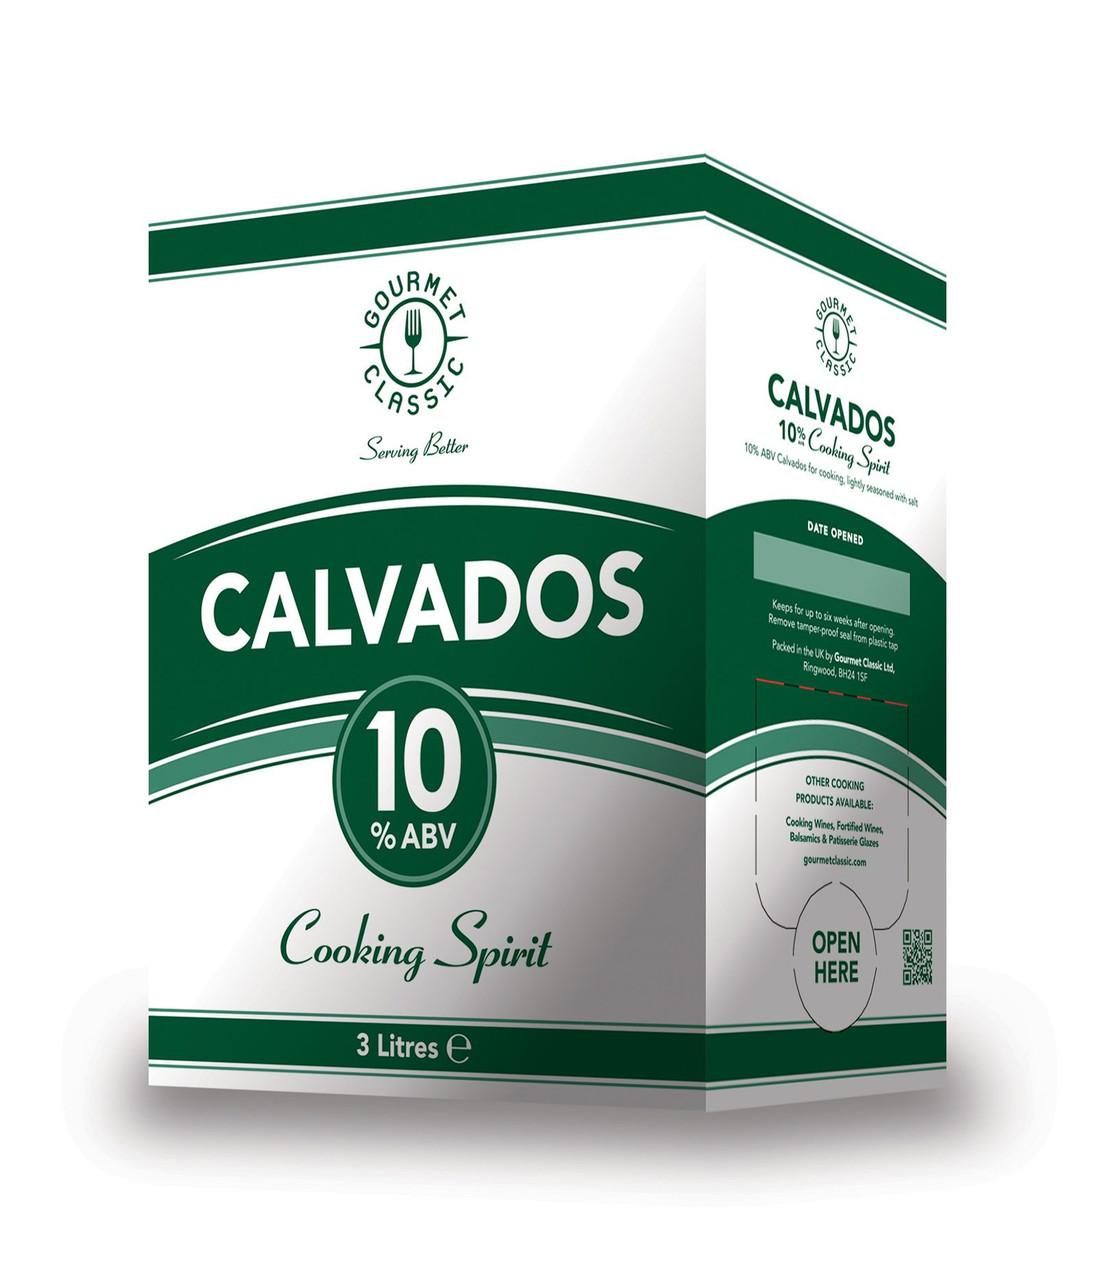 GOURMET CLASSIC COOKING CALVADOS 10% 3L